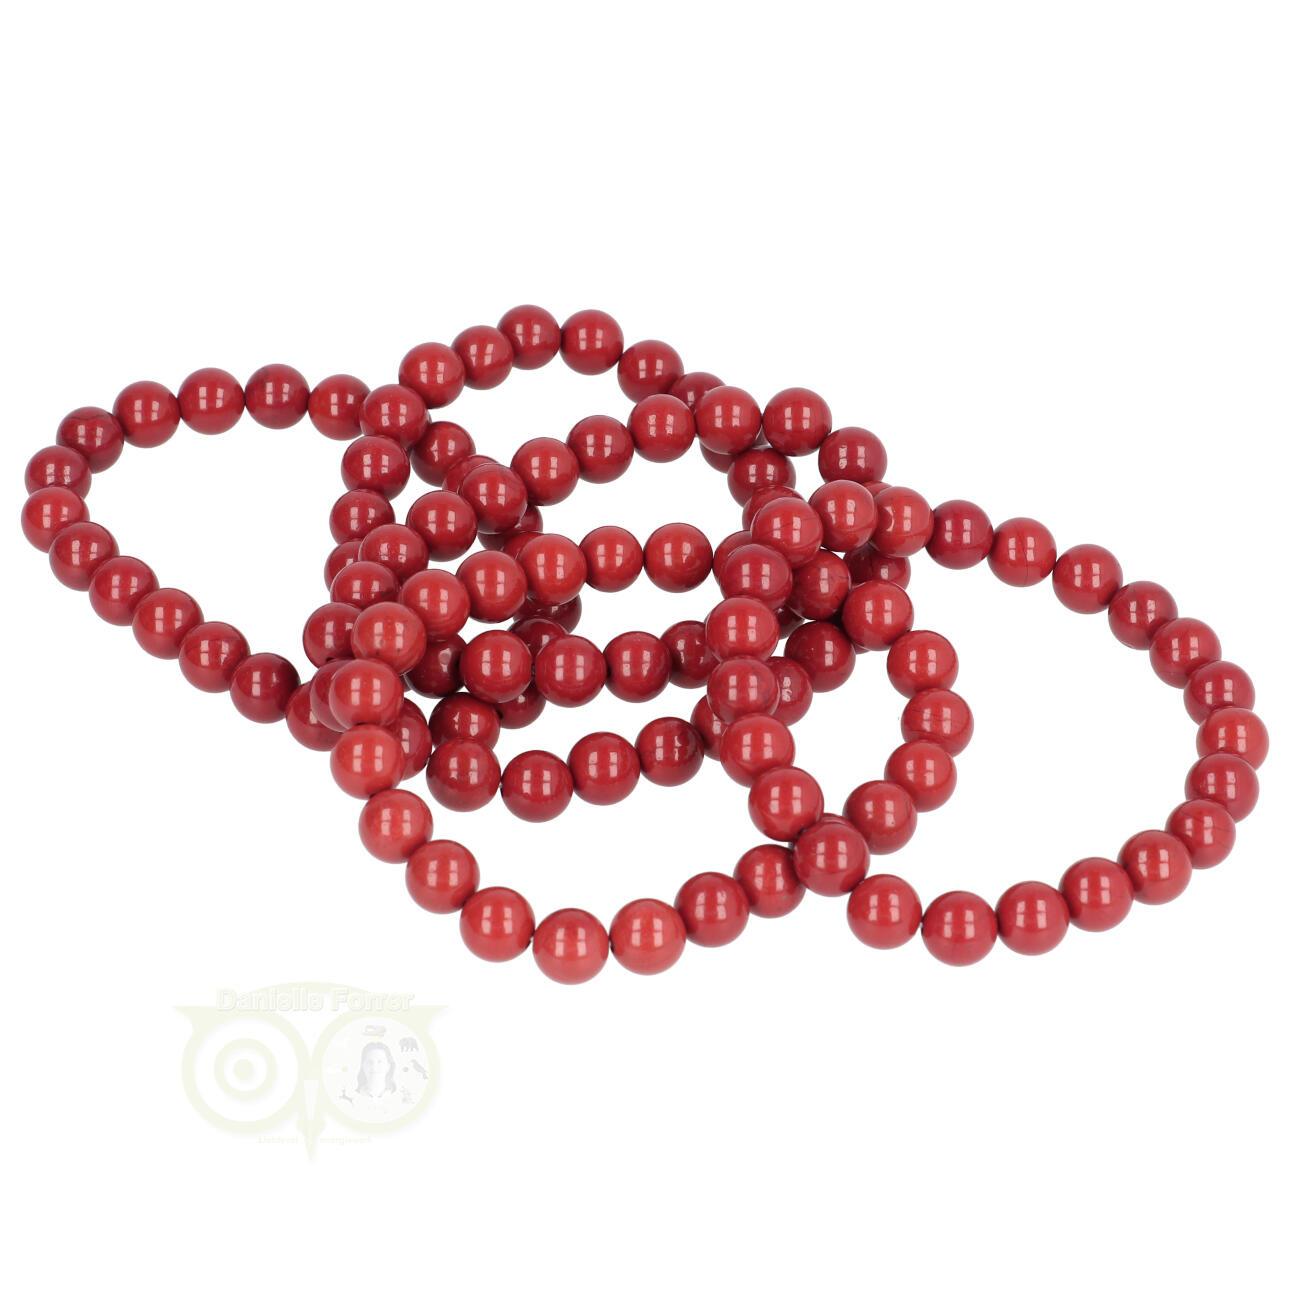 Rode Jaspis kralen armband 8 mm - Edelstenen sieraden kopen